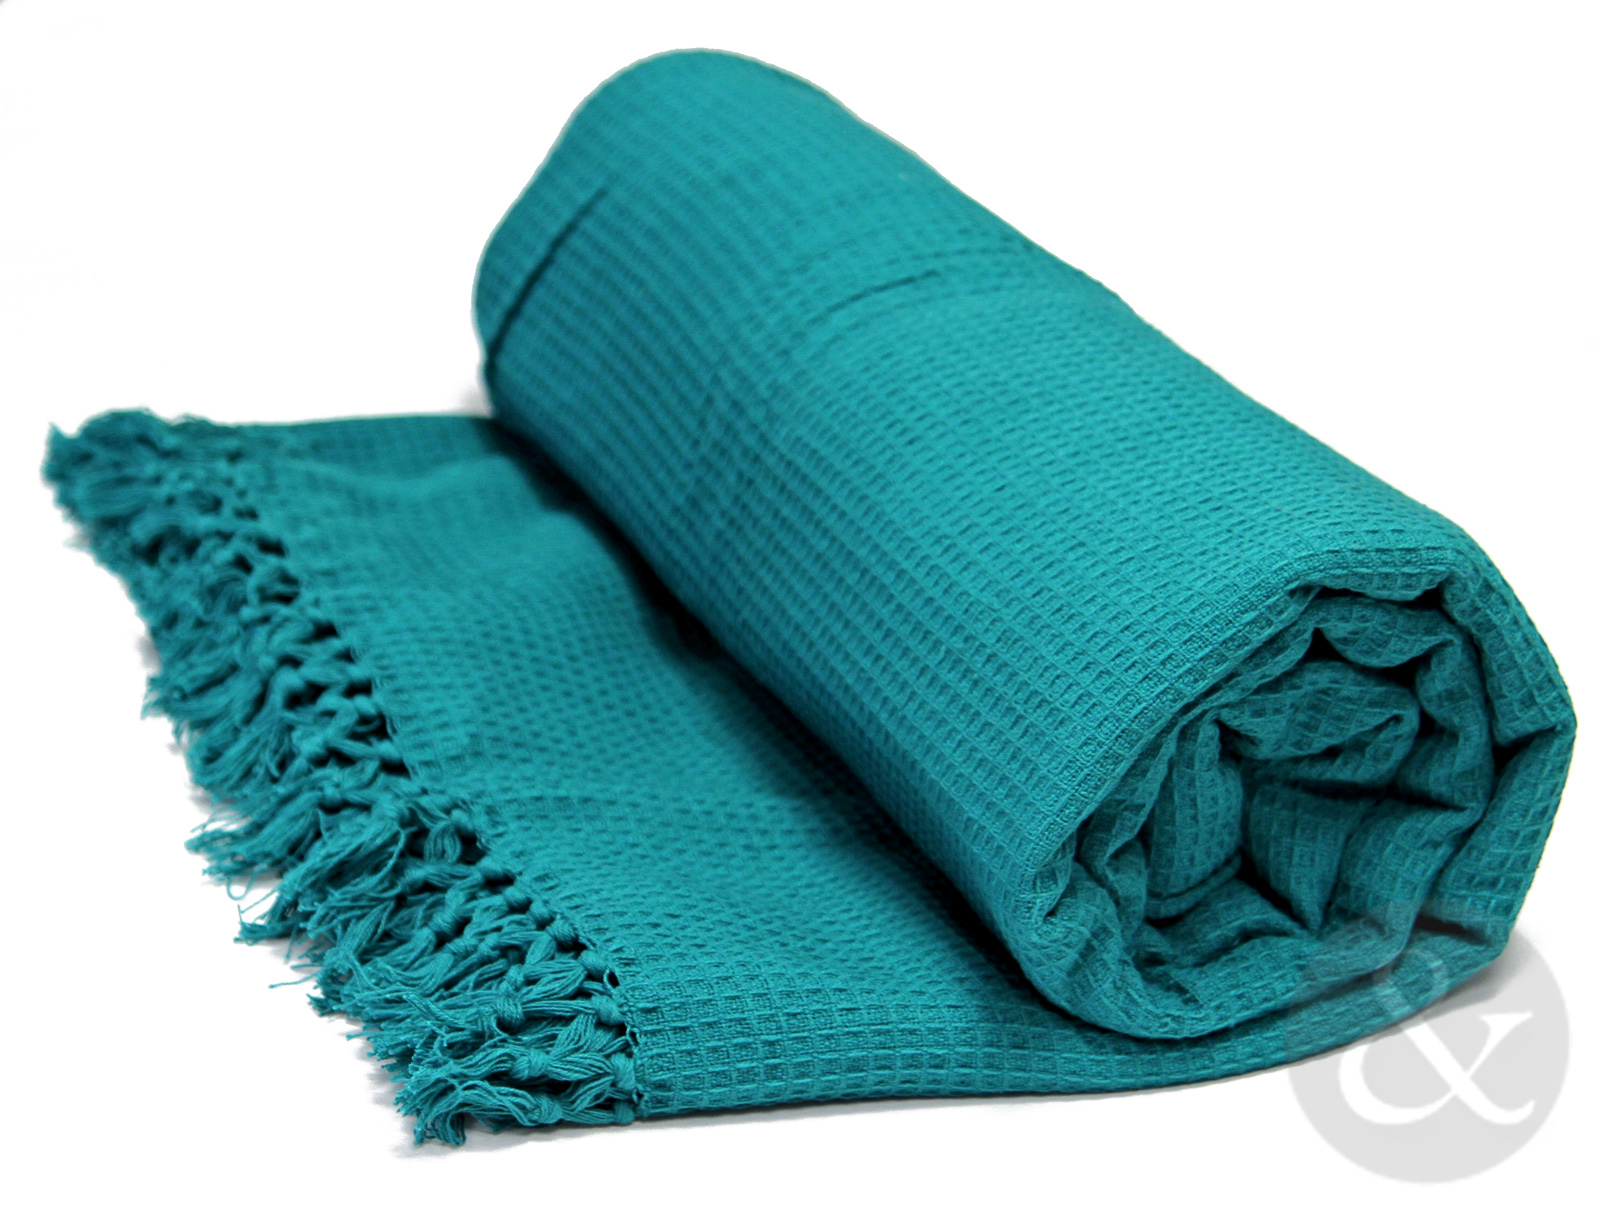 Soft 100% Cotton Honey b Throw With Tasselled Edge Sofa Cover